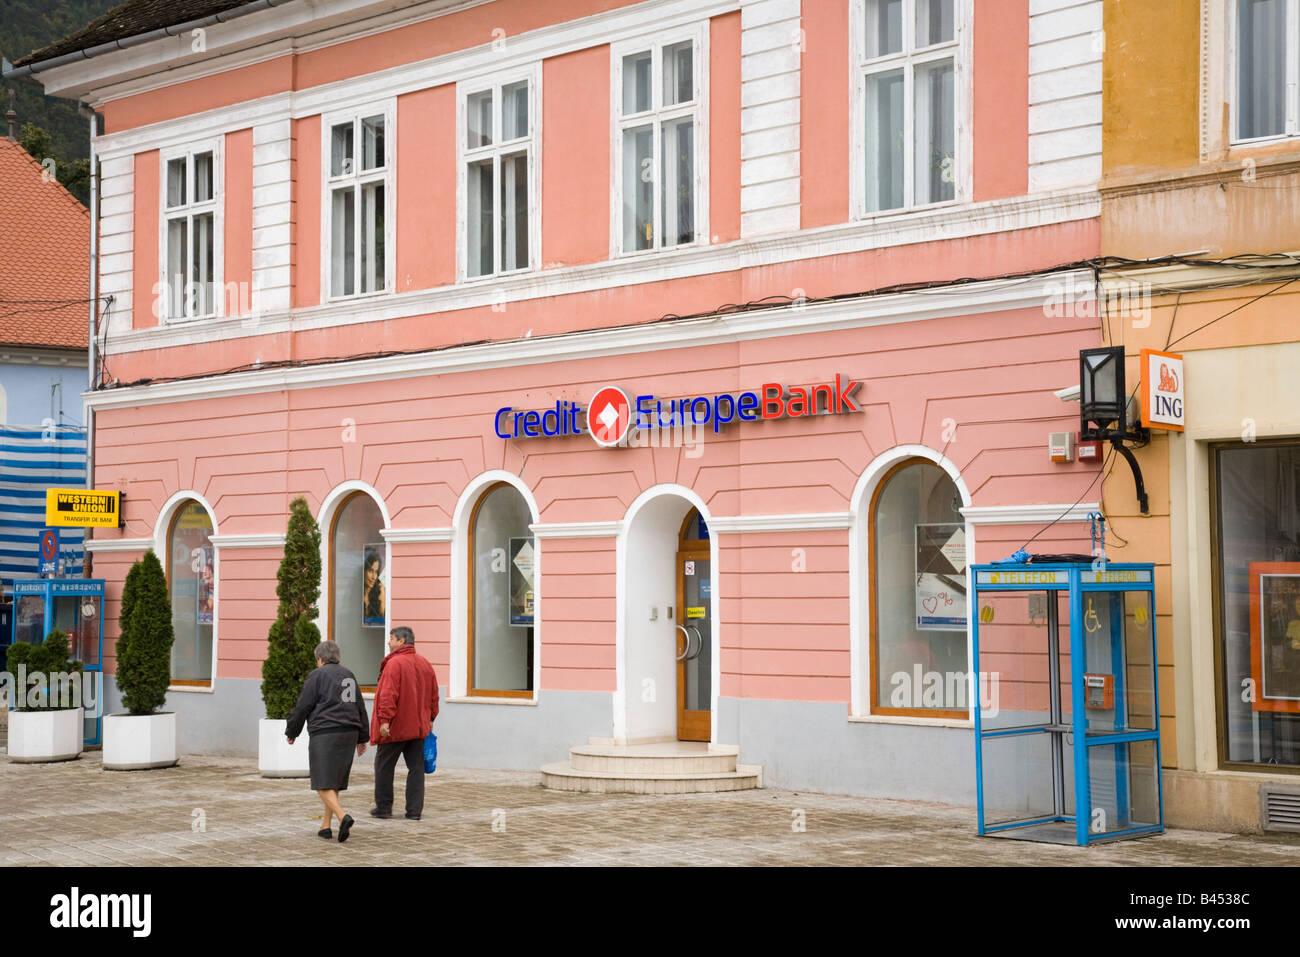 Brasov Transylvania Romania Europe Credit Europe Bank retail banking branch building exterior in historic city - Stock Image